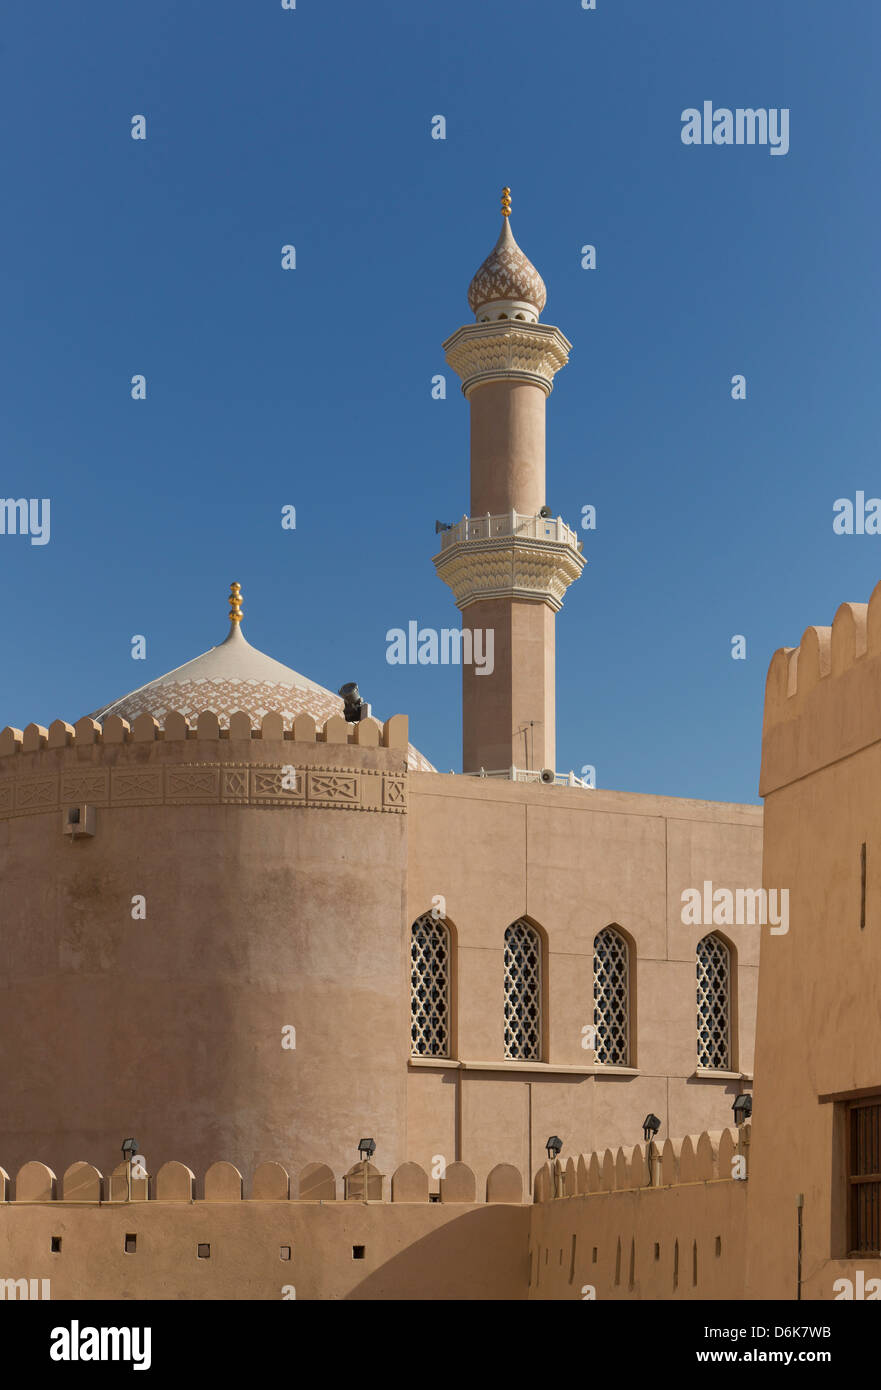 Nizwa, Oman, Middle East - Stock Image